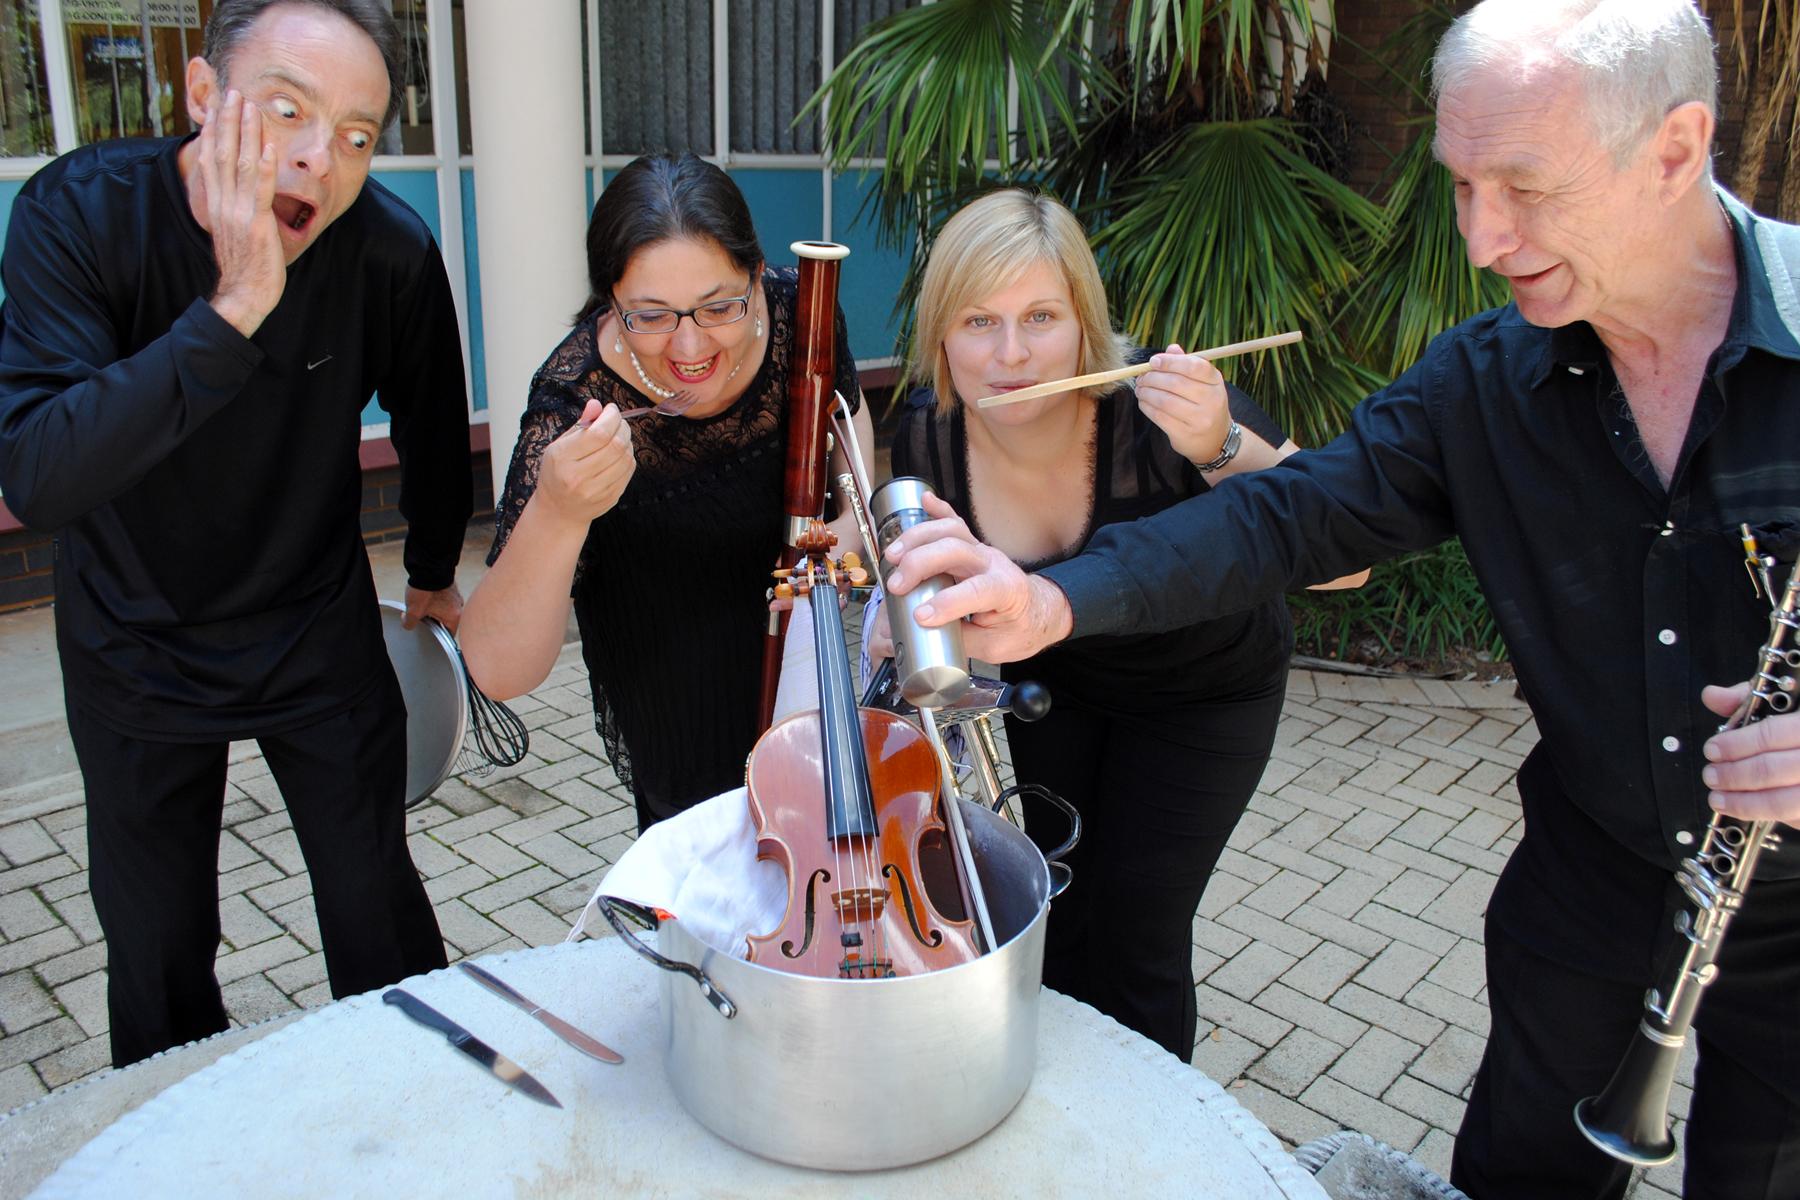 Serving up some Martinu: Piet Koornhof (violin), Liesl van der Merwe (bassoon), Yvonne-Marié Brand (trumpet) & Brian Nelson (clarinet). [Marike Prins (double bass) and Tinus Botha (piano) were not present when hilarity ensued.]